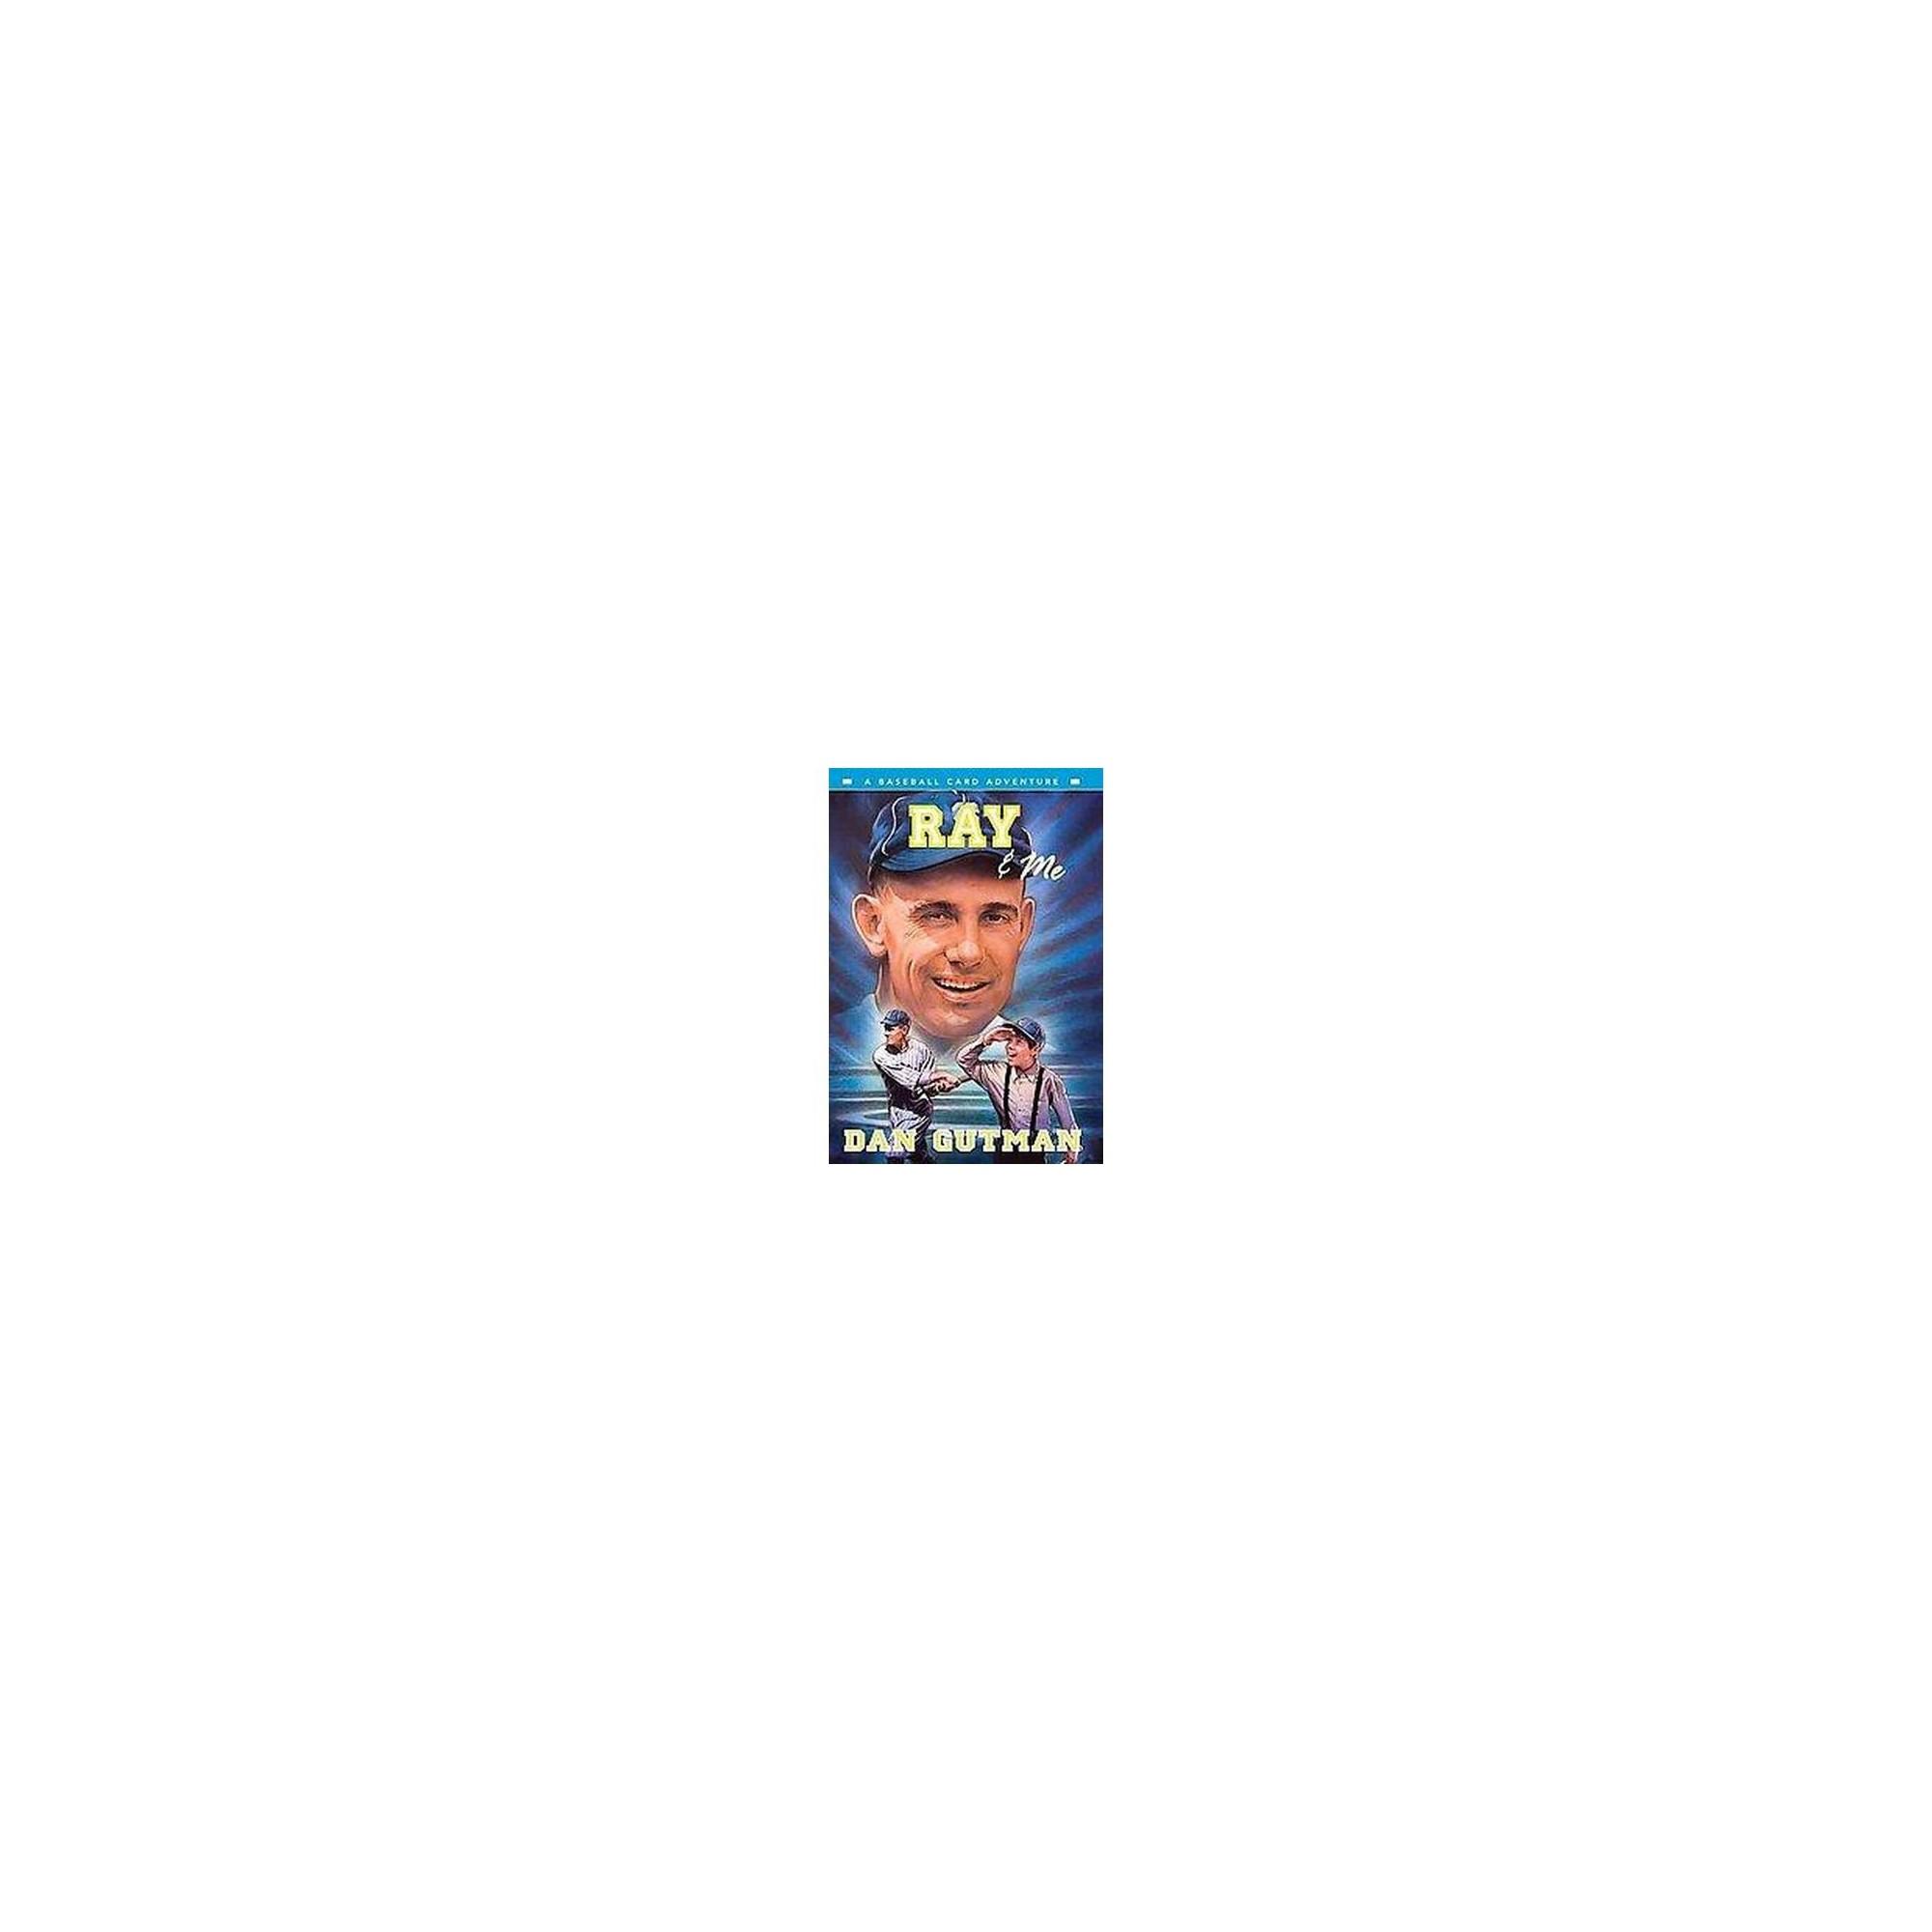 Ray Me Baseball Card Adventures Hardcover By Dan Gutman